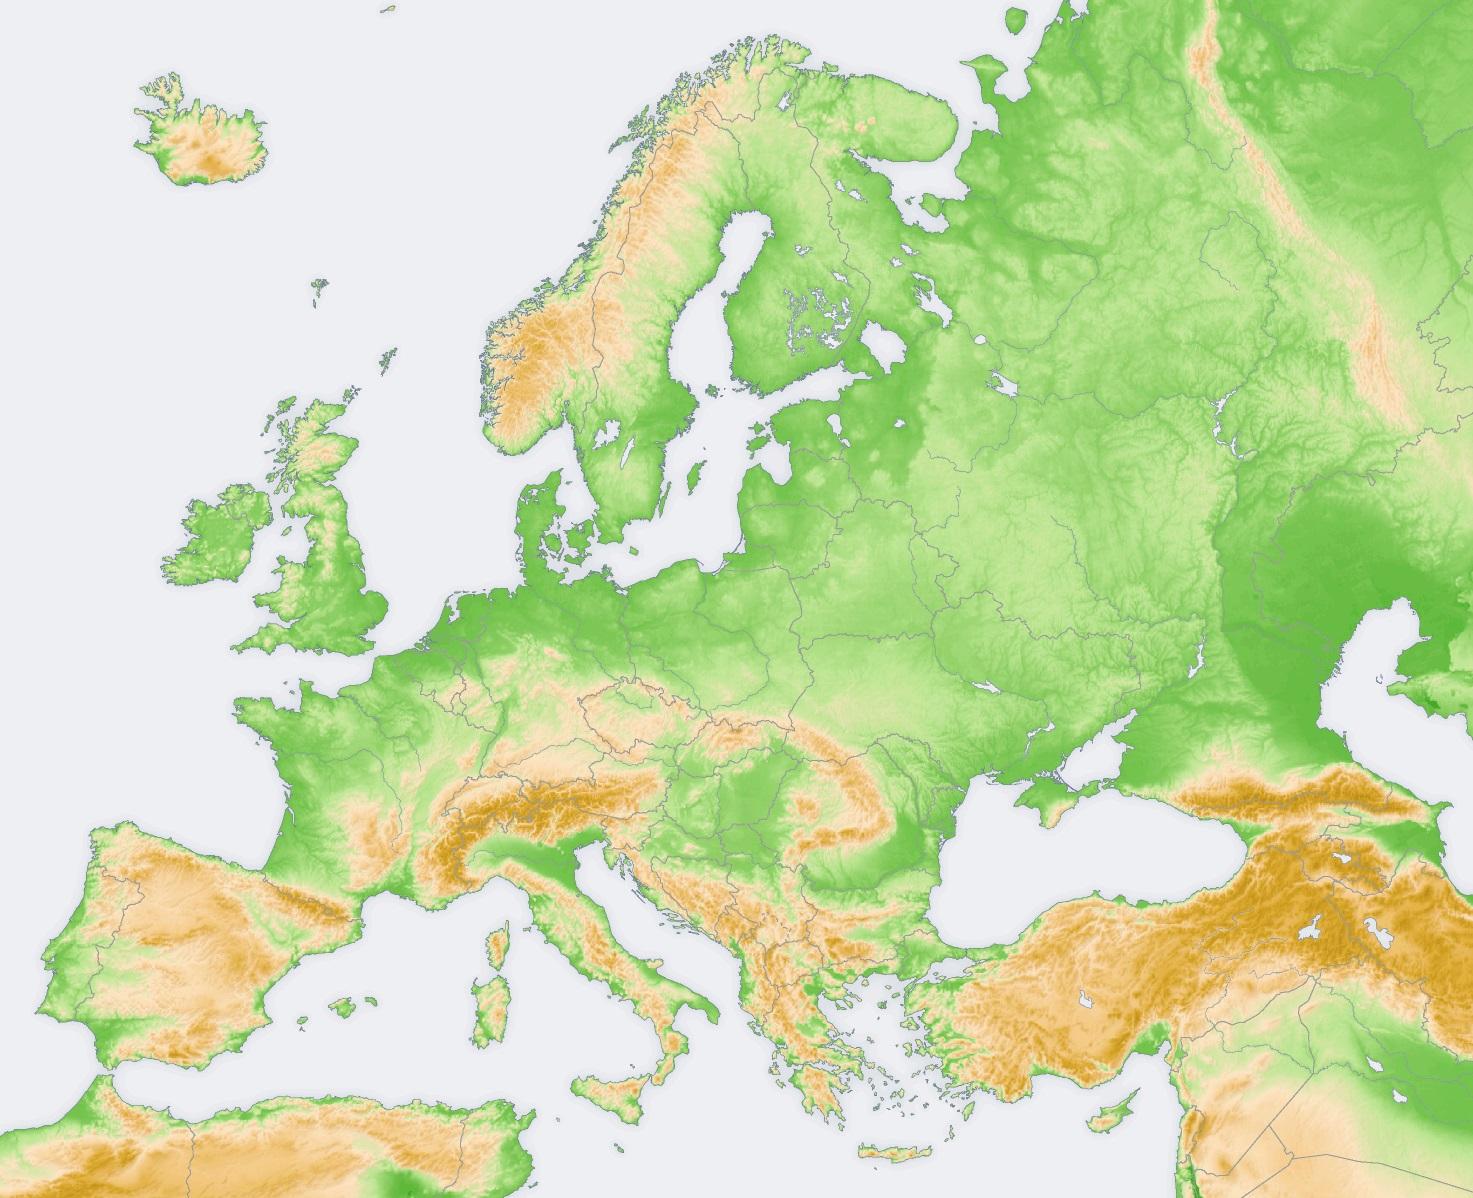 Mapa Mudo Relieve Europa.Juegos De Geografia Juego De Relieve De Europa Sistemas